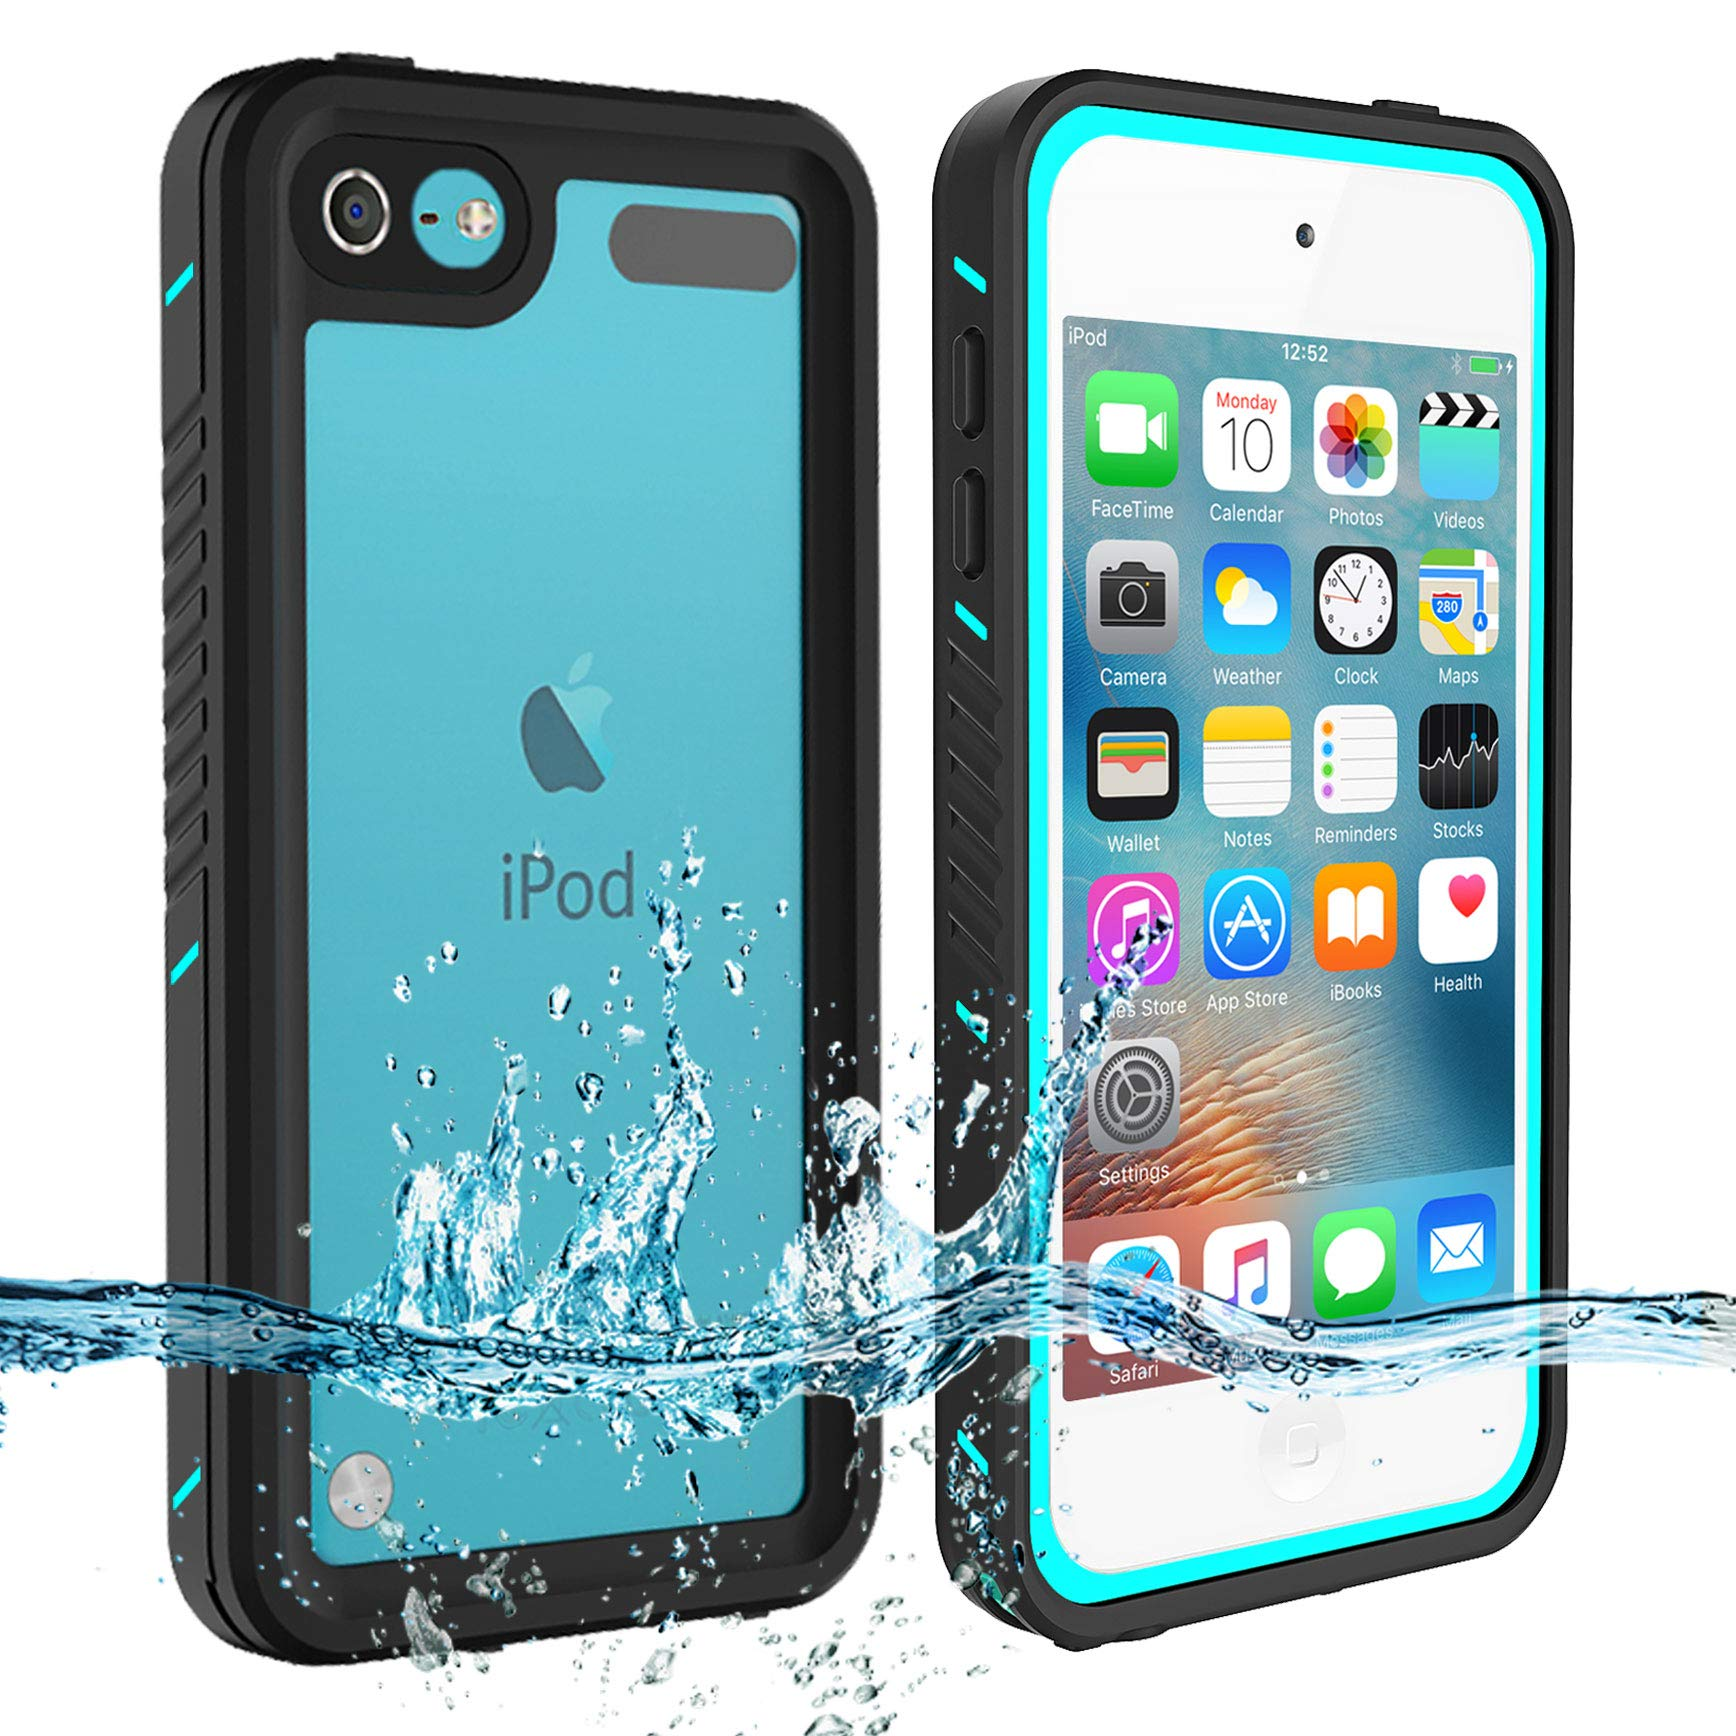 Waterproof BESINPO Protective Shockproof Anti Scratch